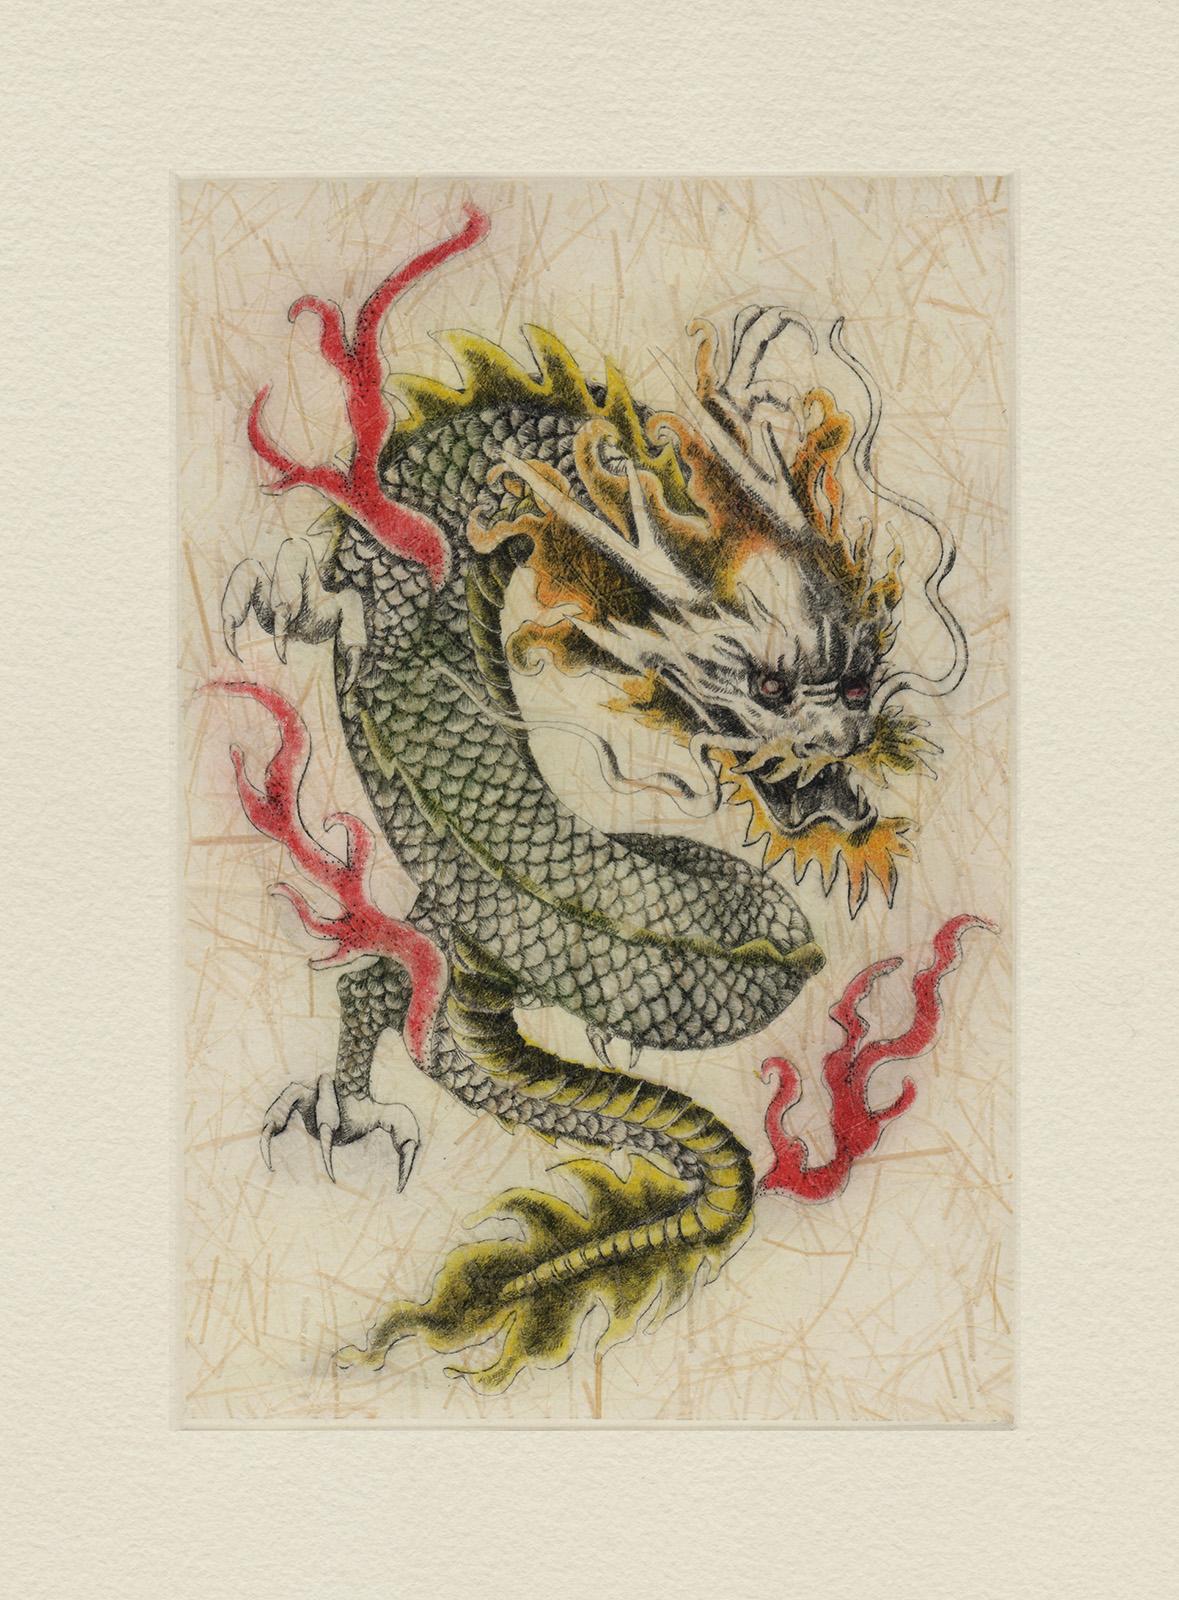 Dragon (drypoint etching by Yaemi Shigyo)